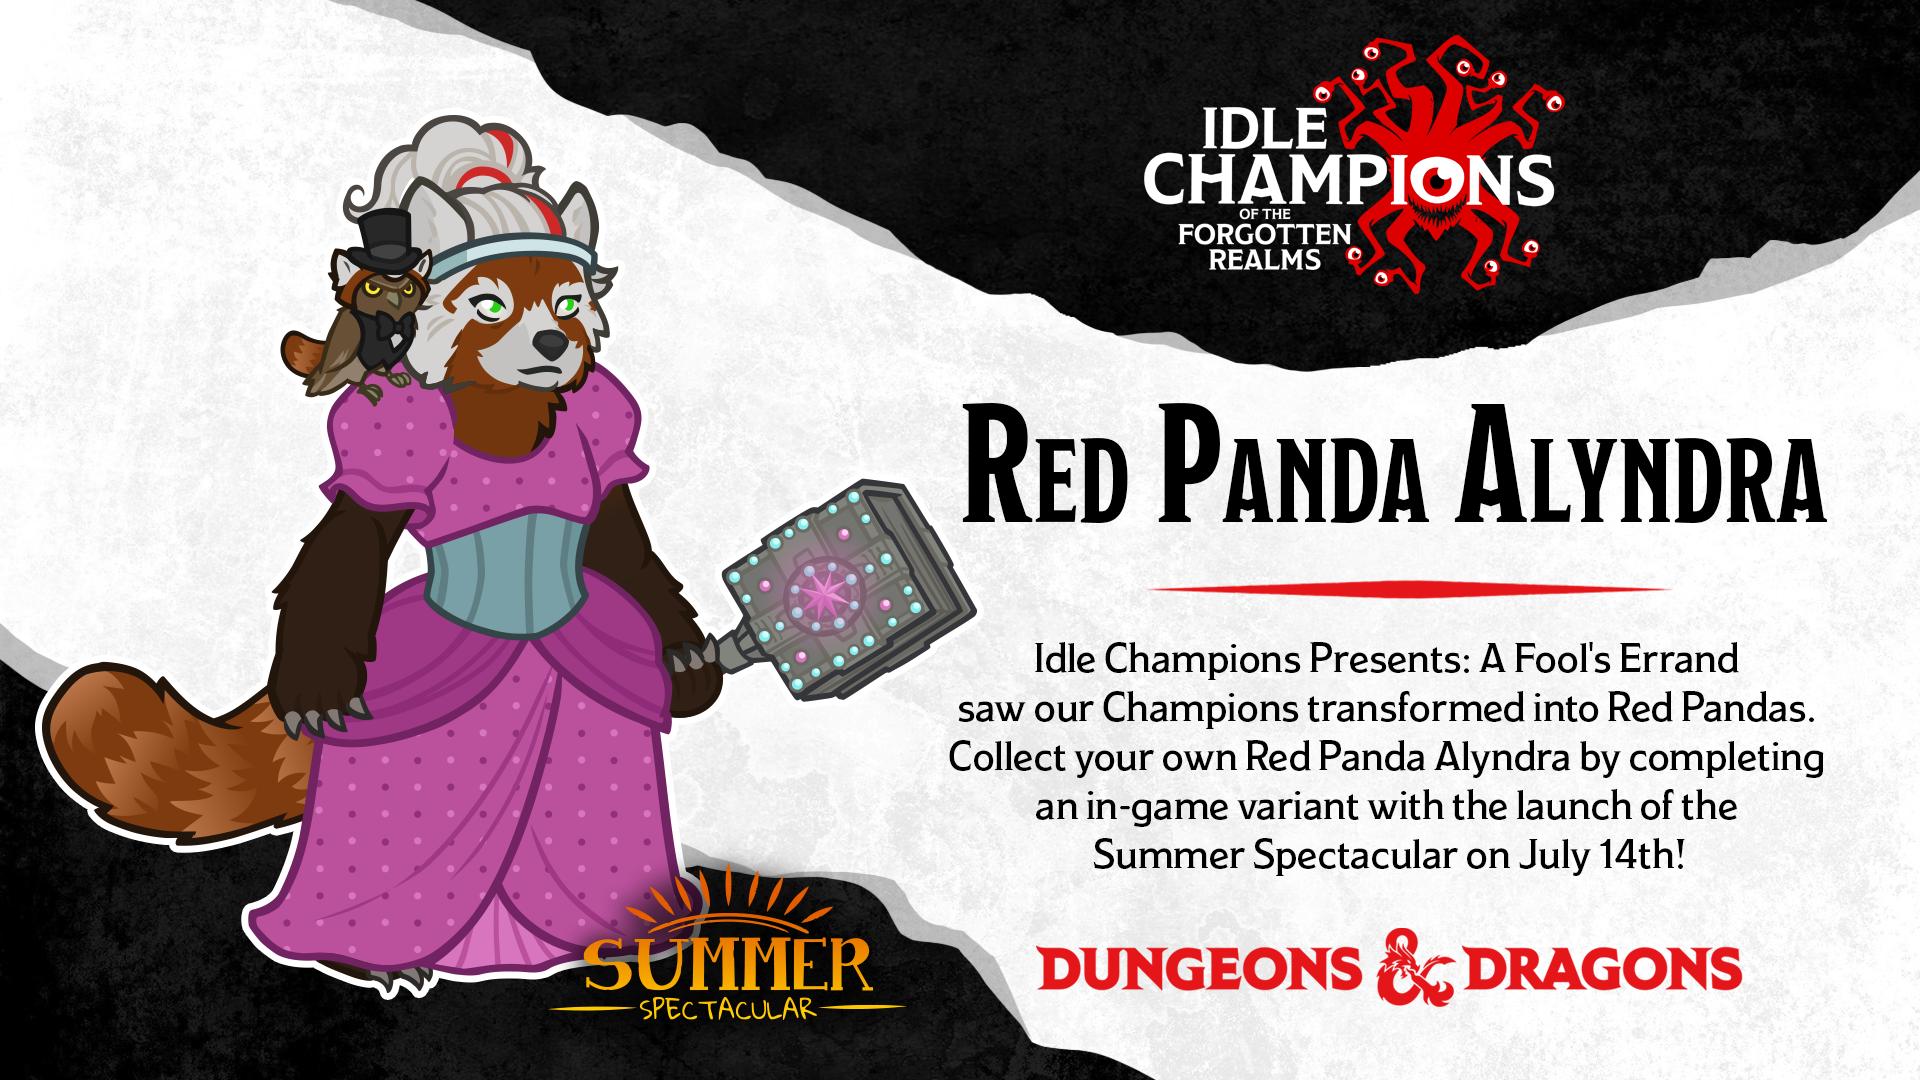 Dungeons & Dragons Summer Spectacular Red Panda Alyndra